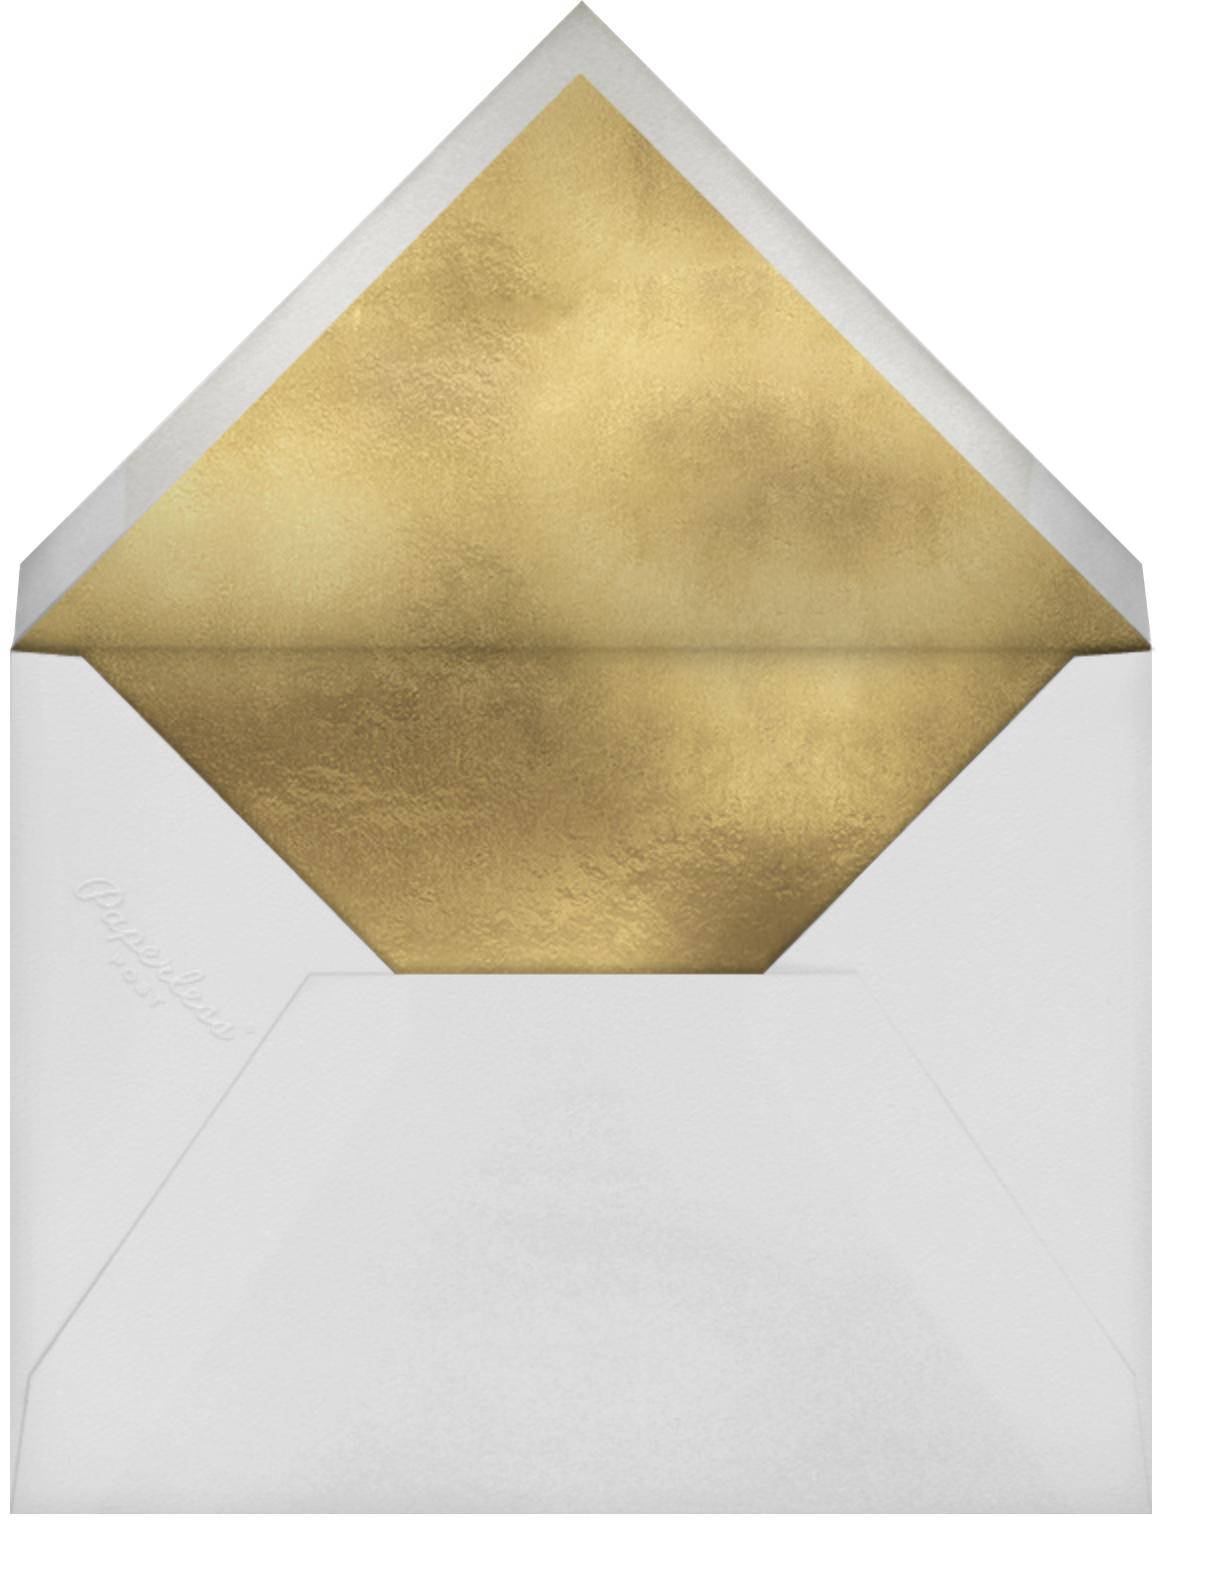 Light Up the Room - Mr. Boddington's Studio - Mr. Boddington's Studio - envelope back